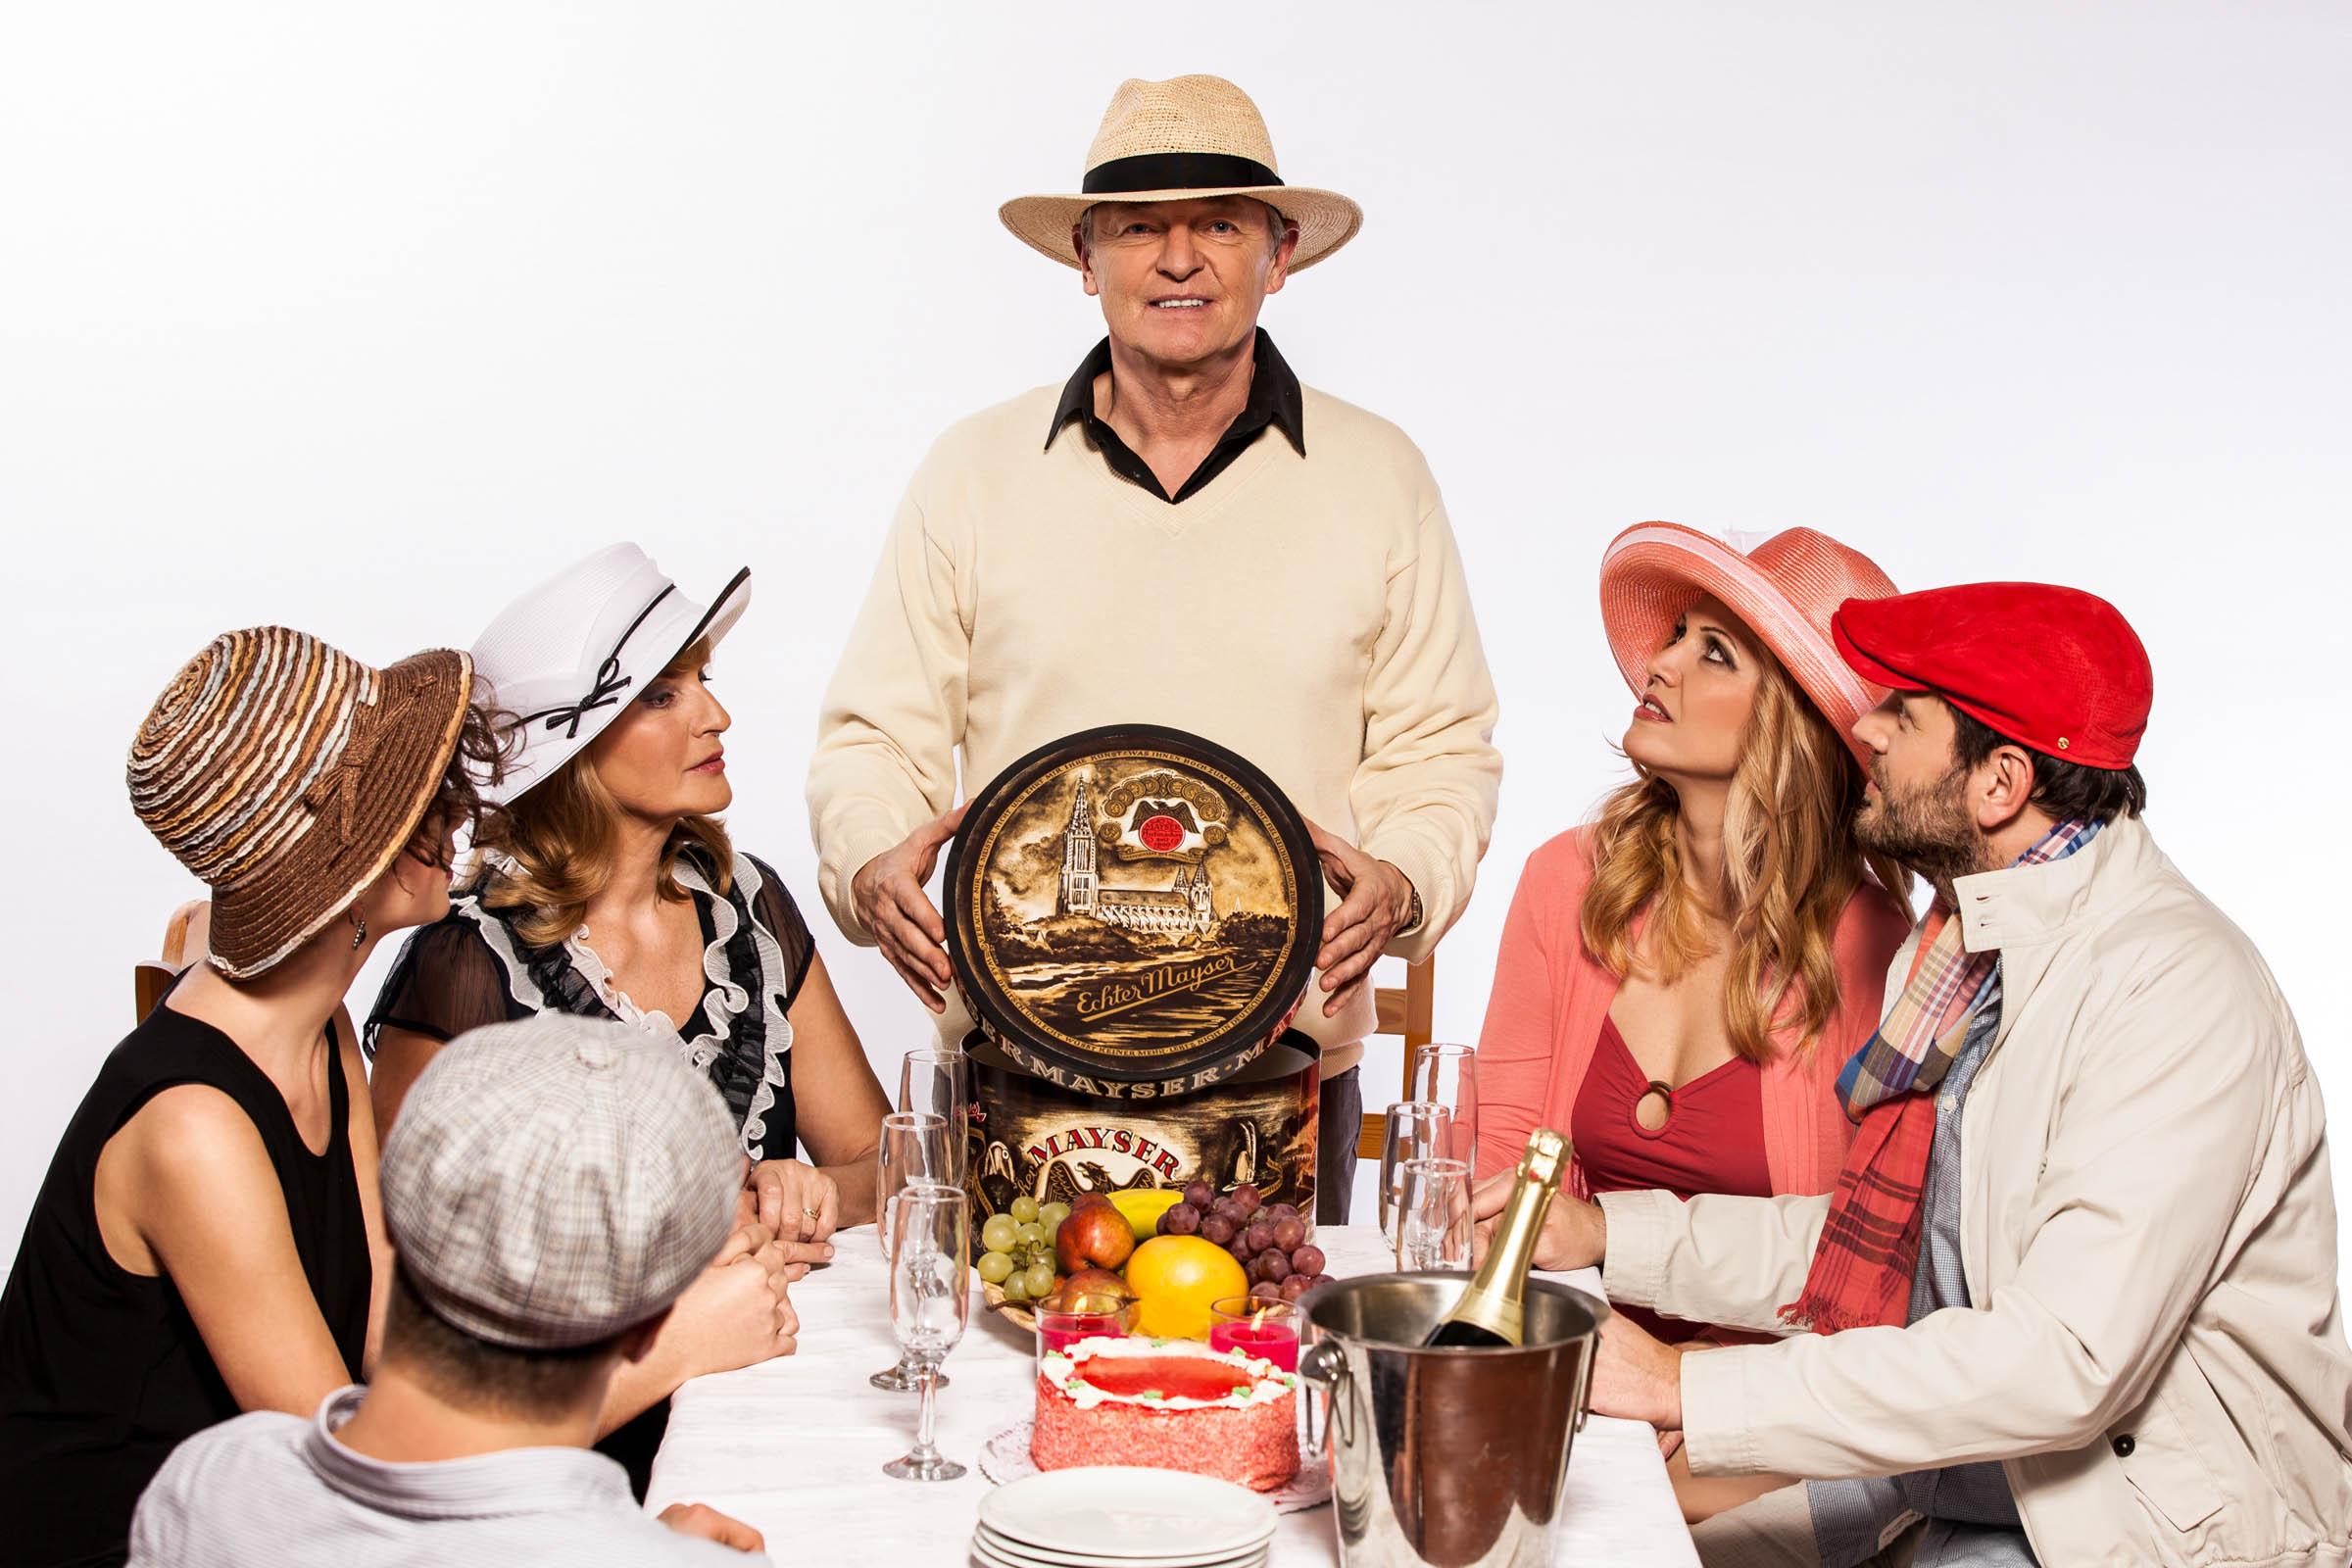 Mayser - reklamná fotografia - Rodinná oslava